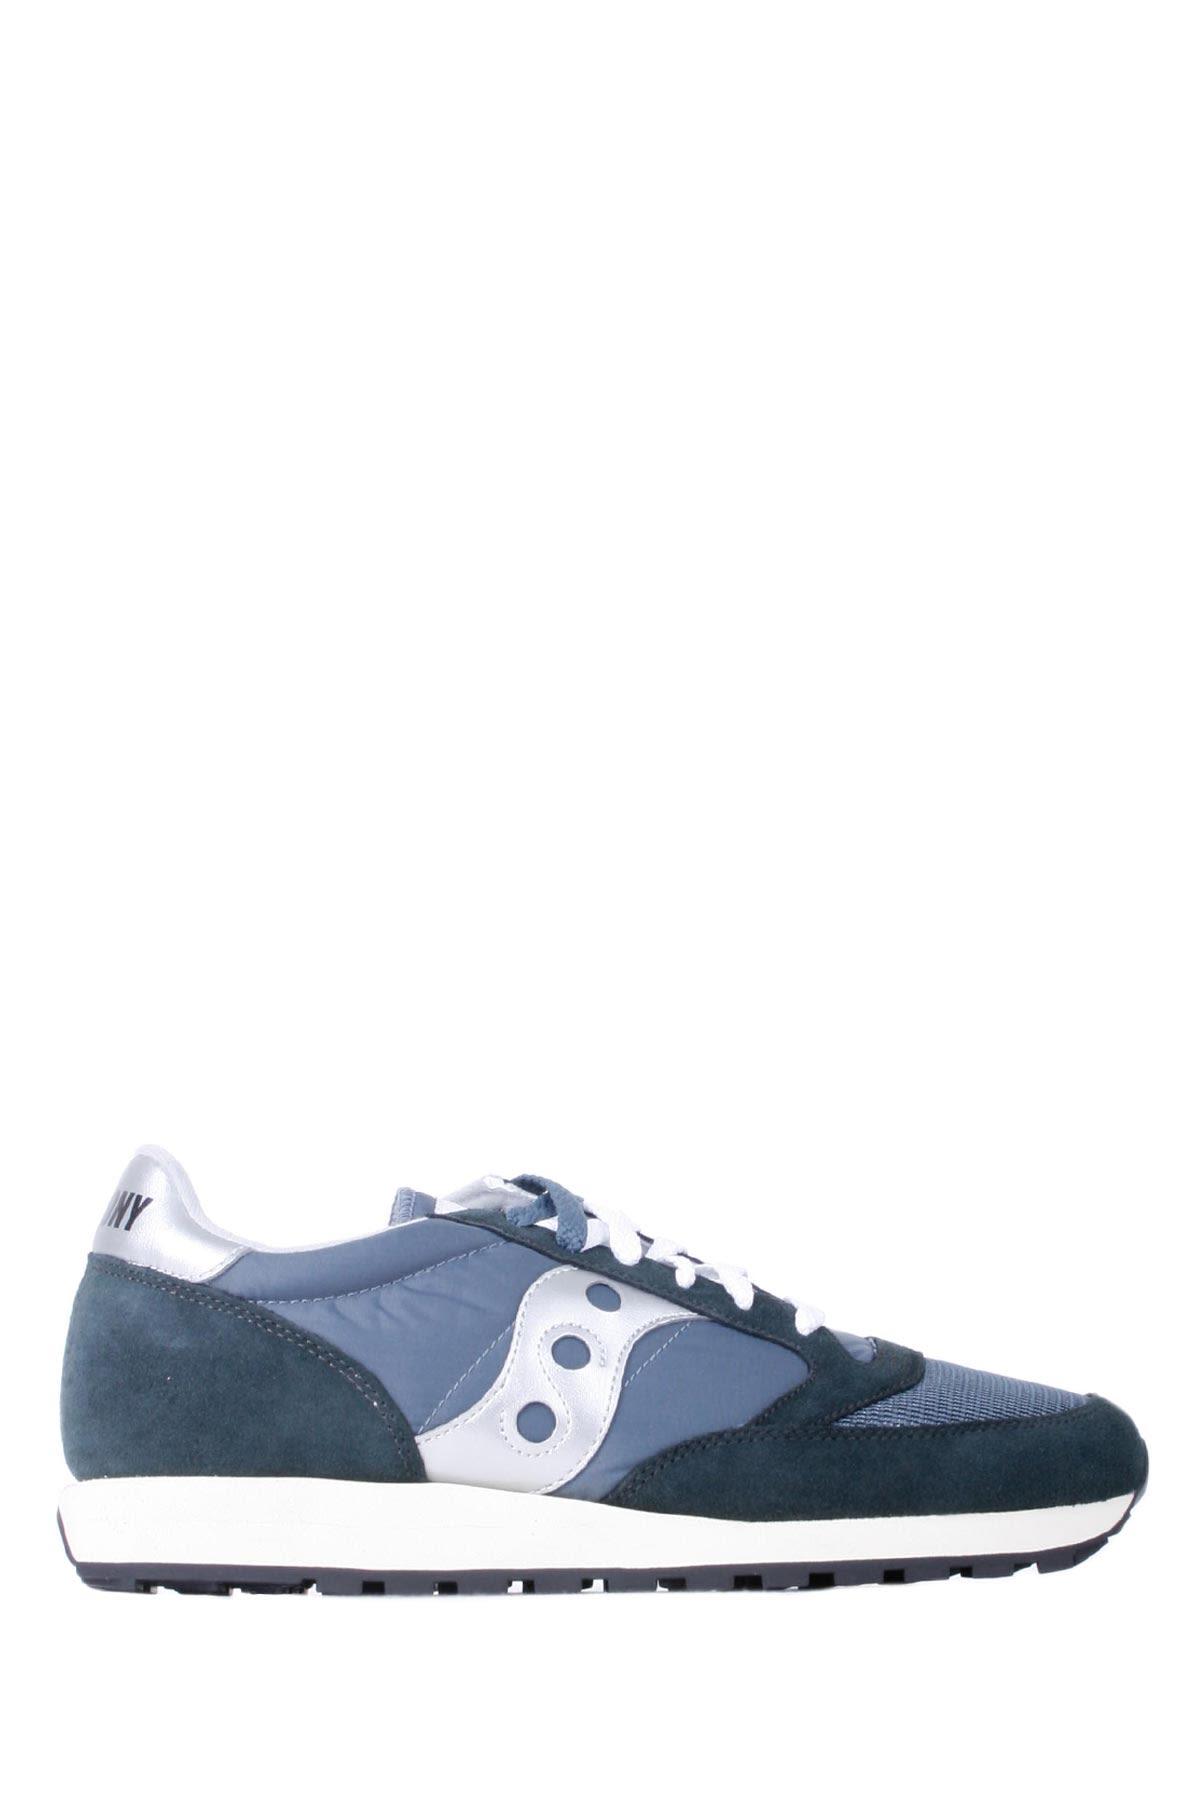 Saucony Vintage Blue, Blue And Silver Man Jazz Original Vintage Running Shoes